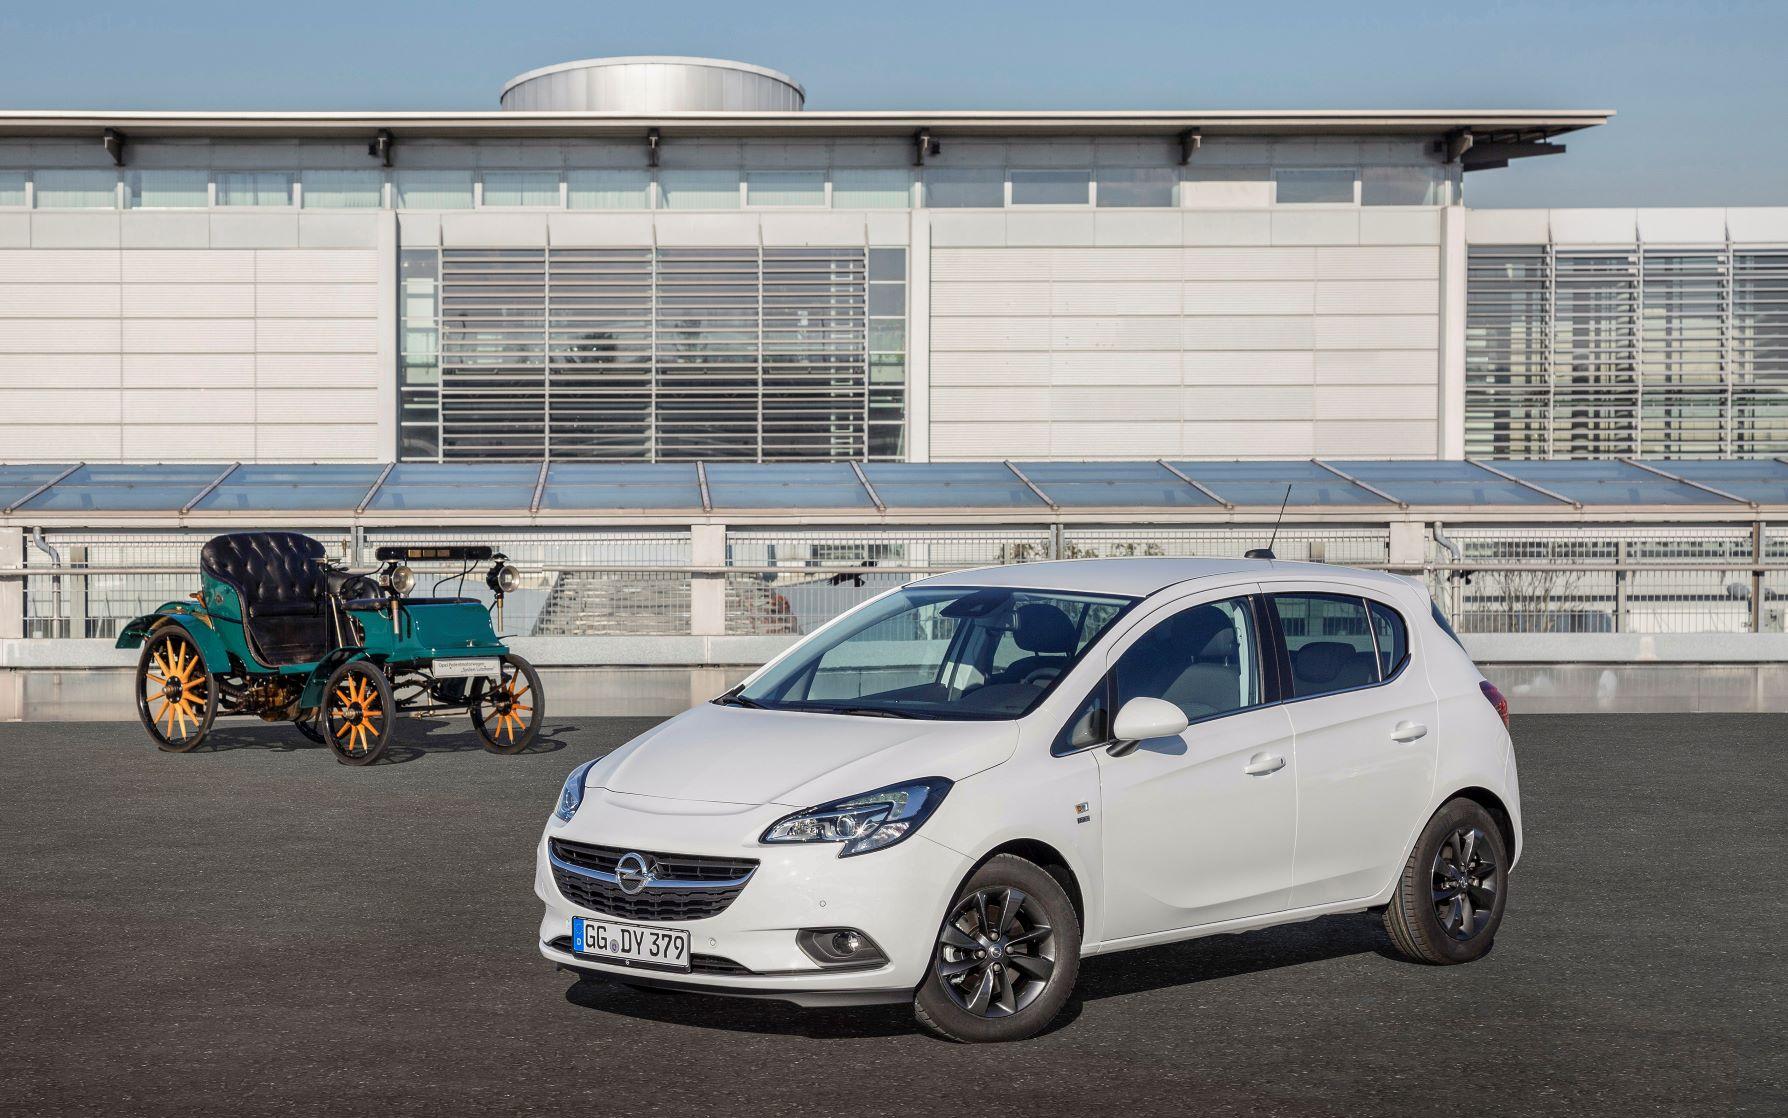 Opel-System-Lutzmann-Corsa-e-505507